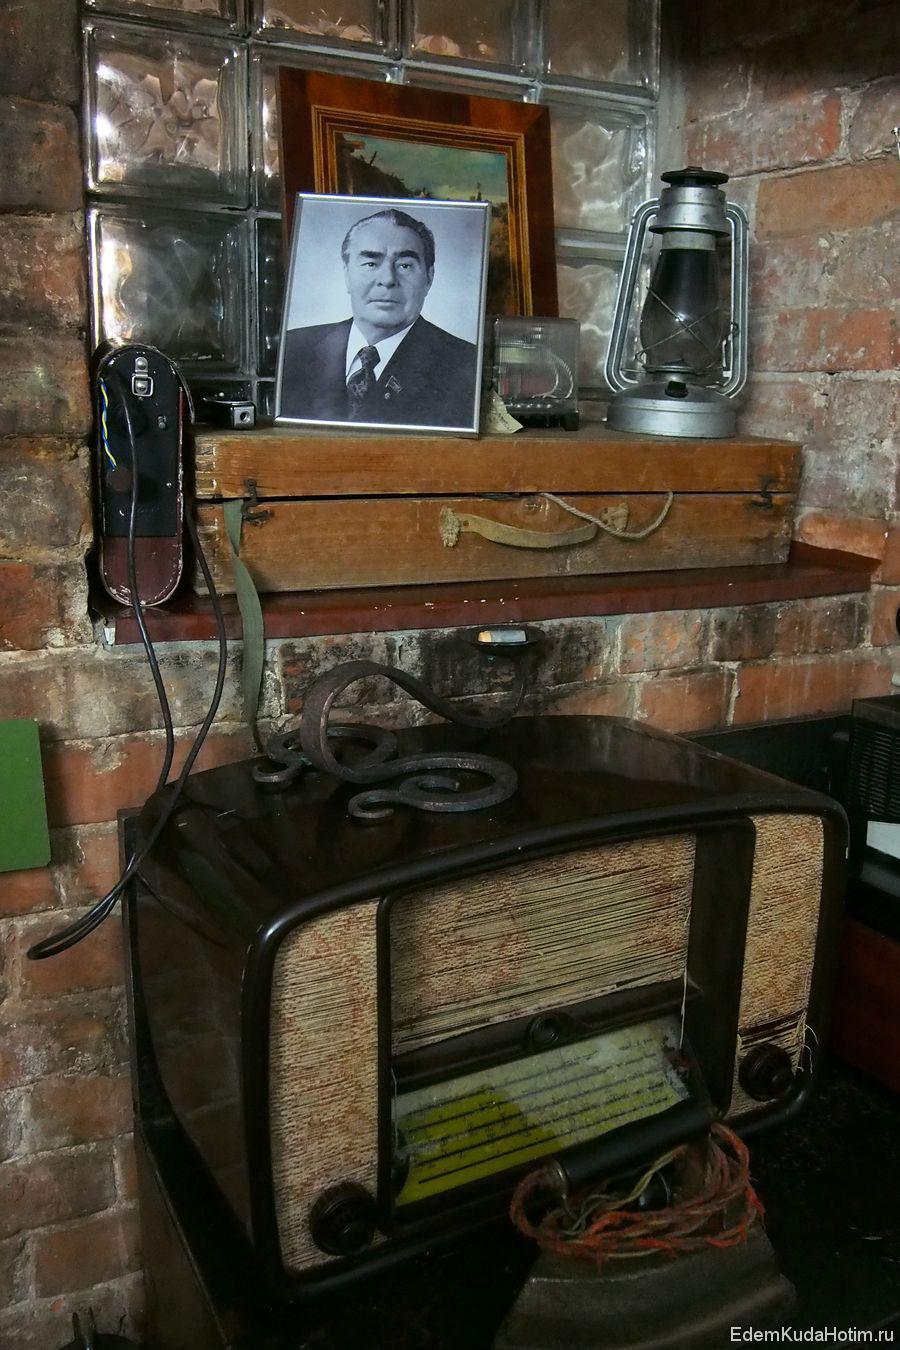 Радиола и портрет Л.И.Брежнева